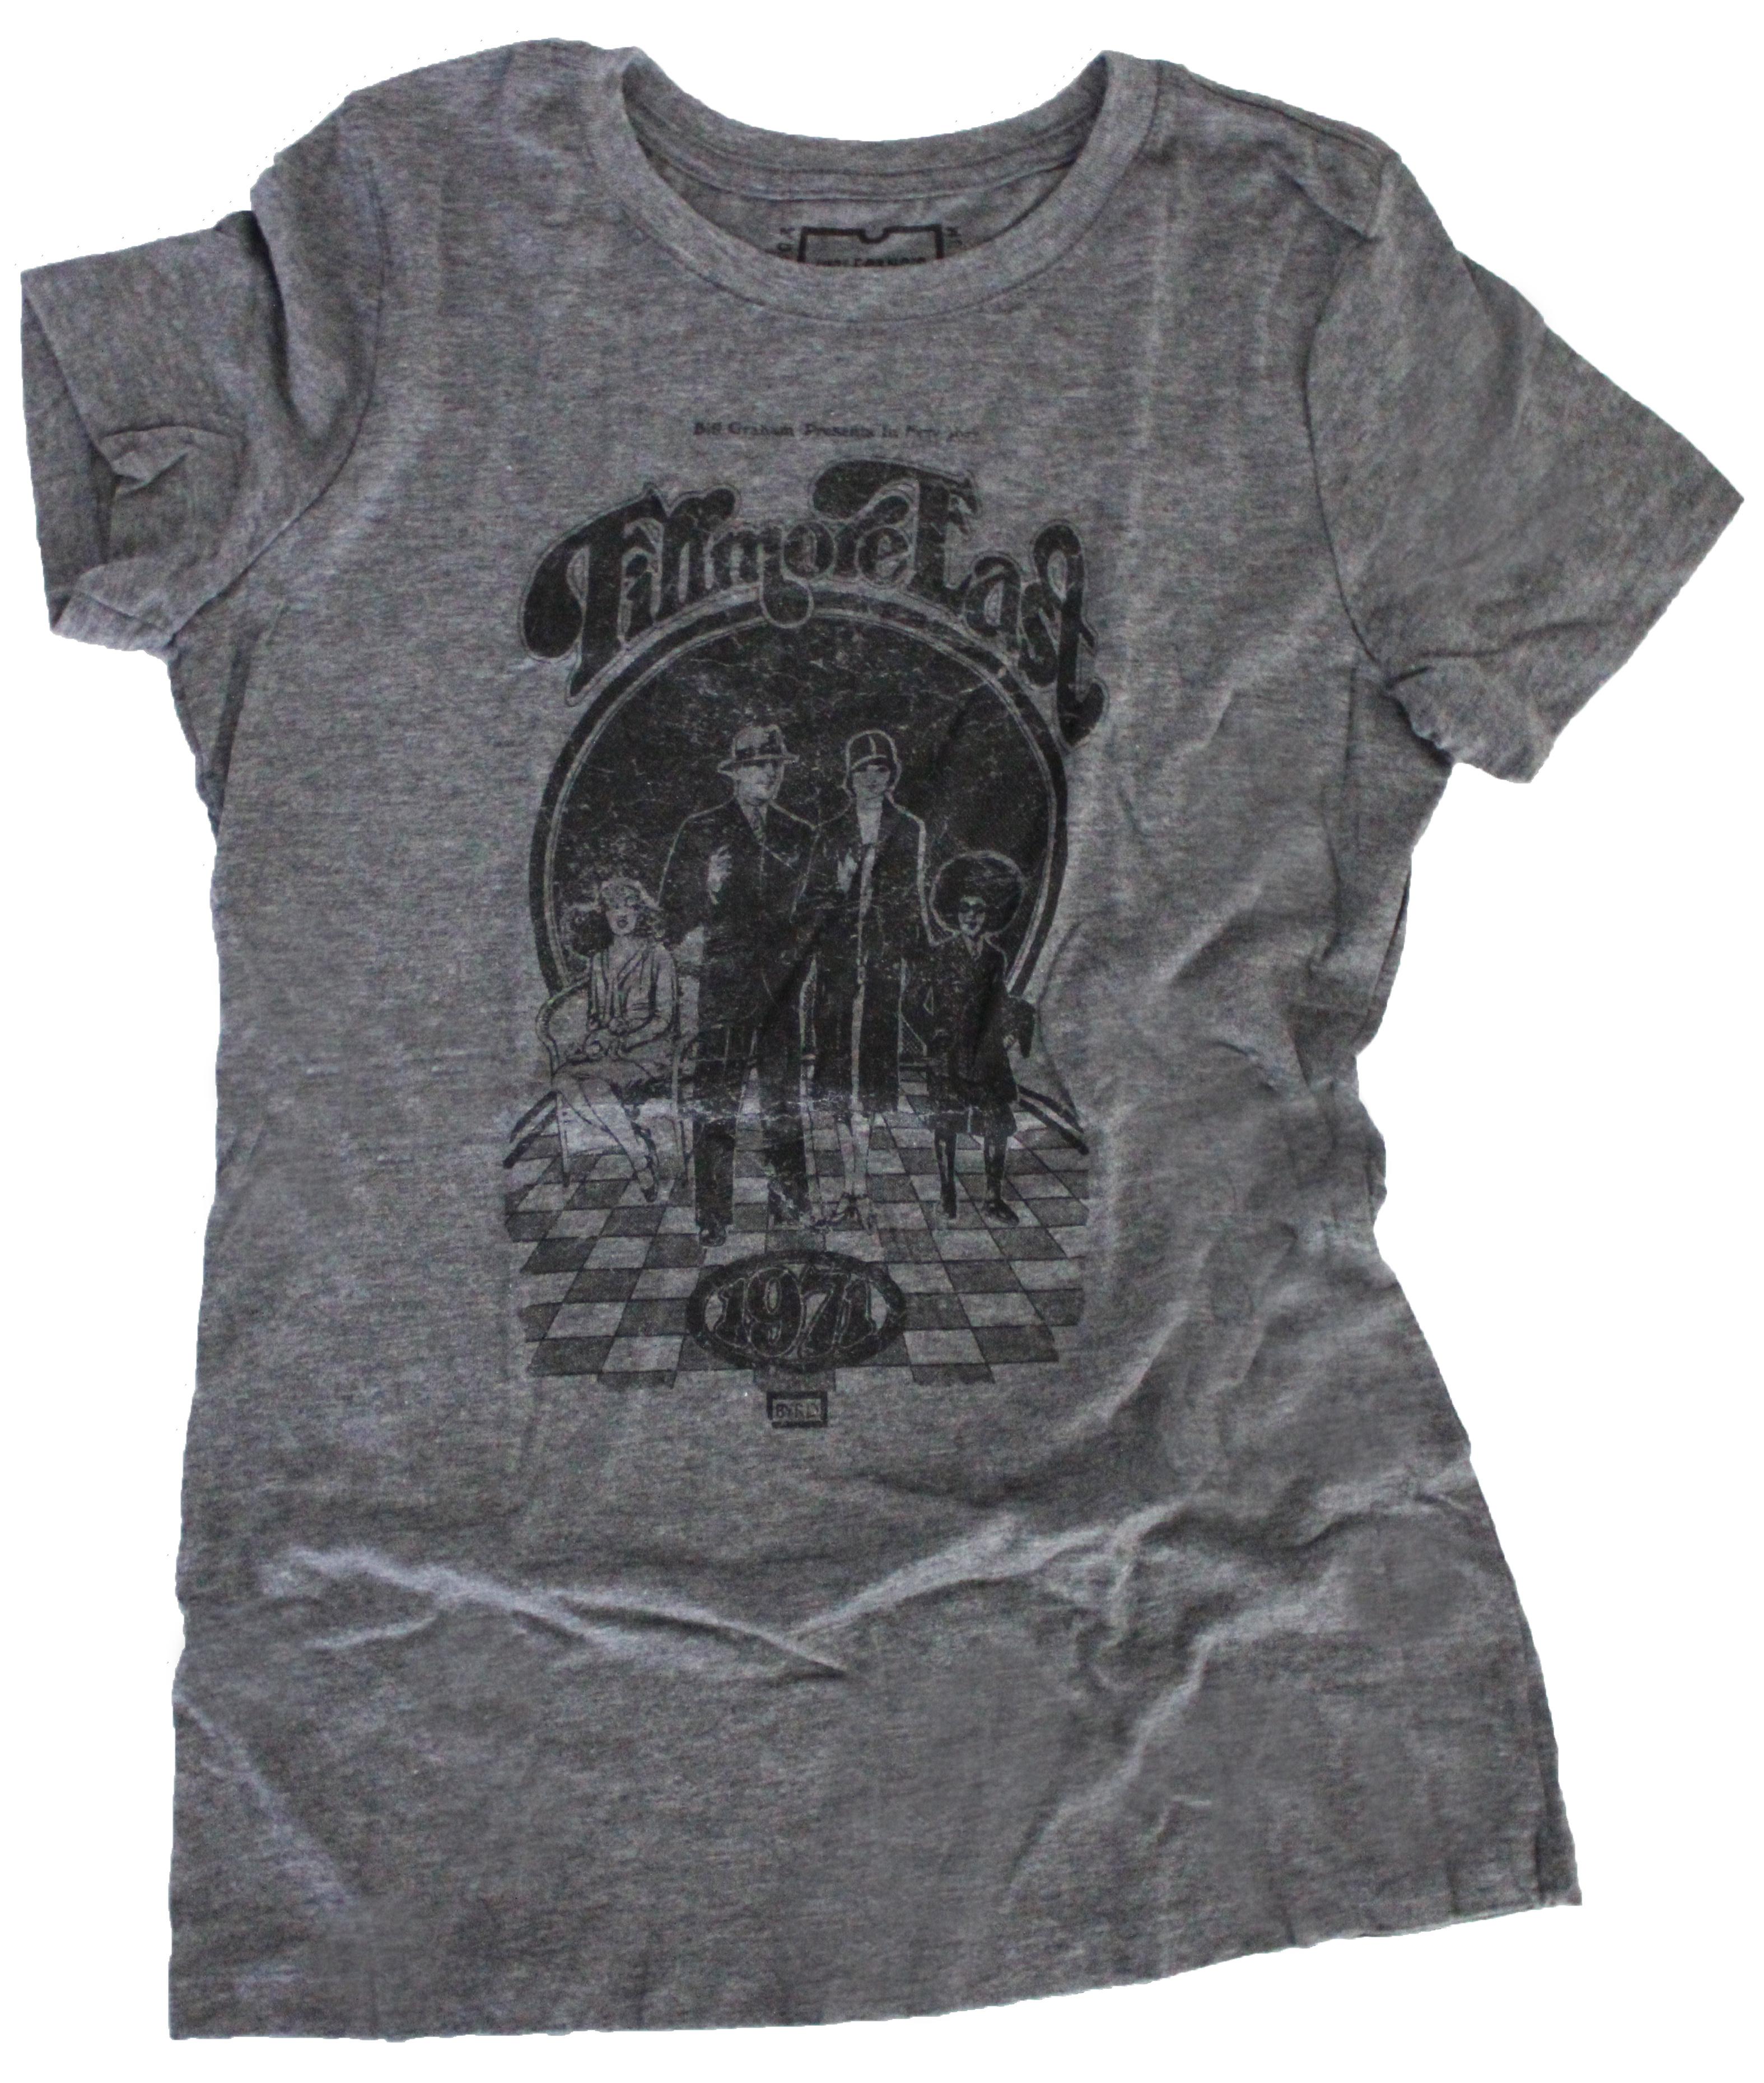 Fillmore East Women's T-Shirt